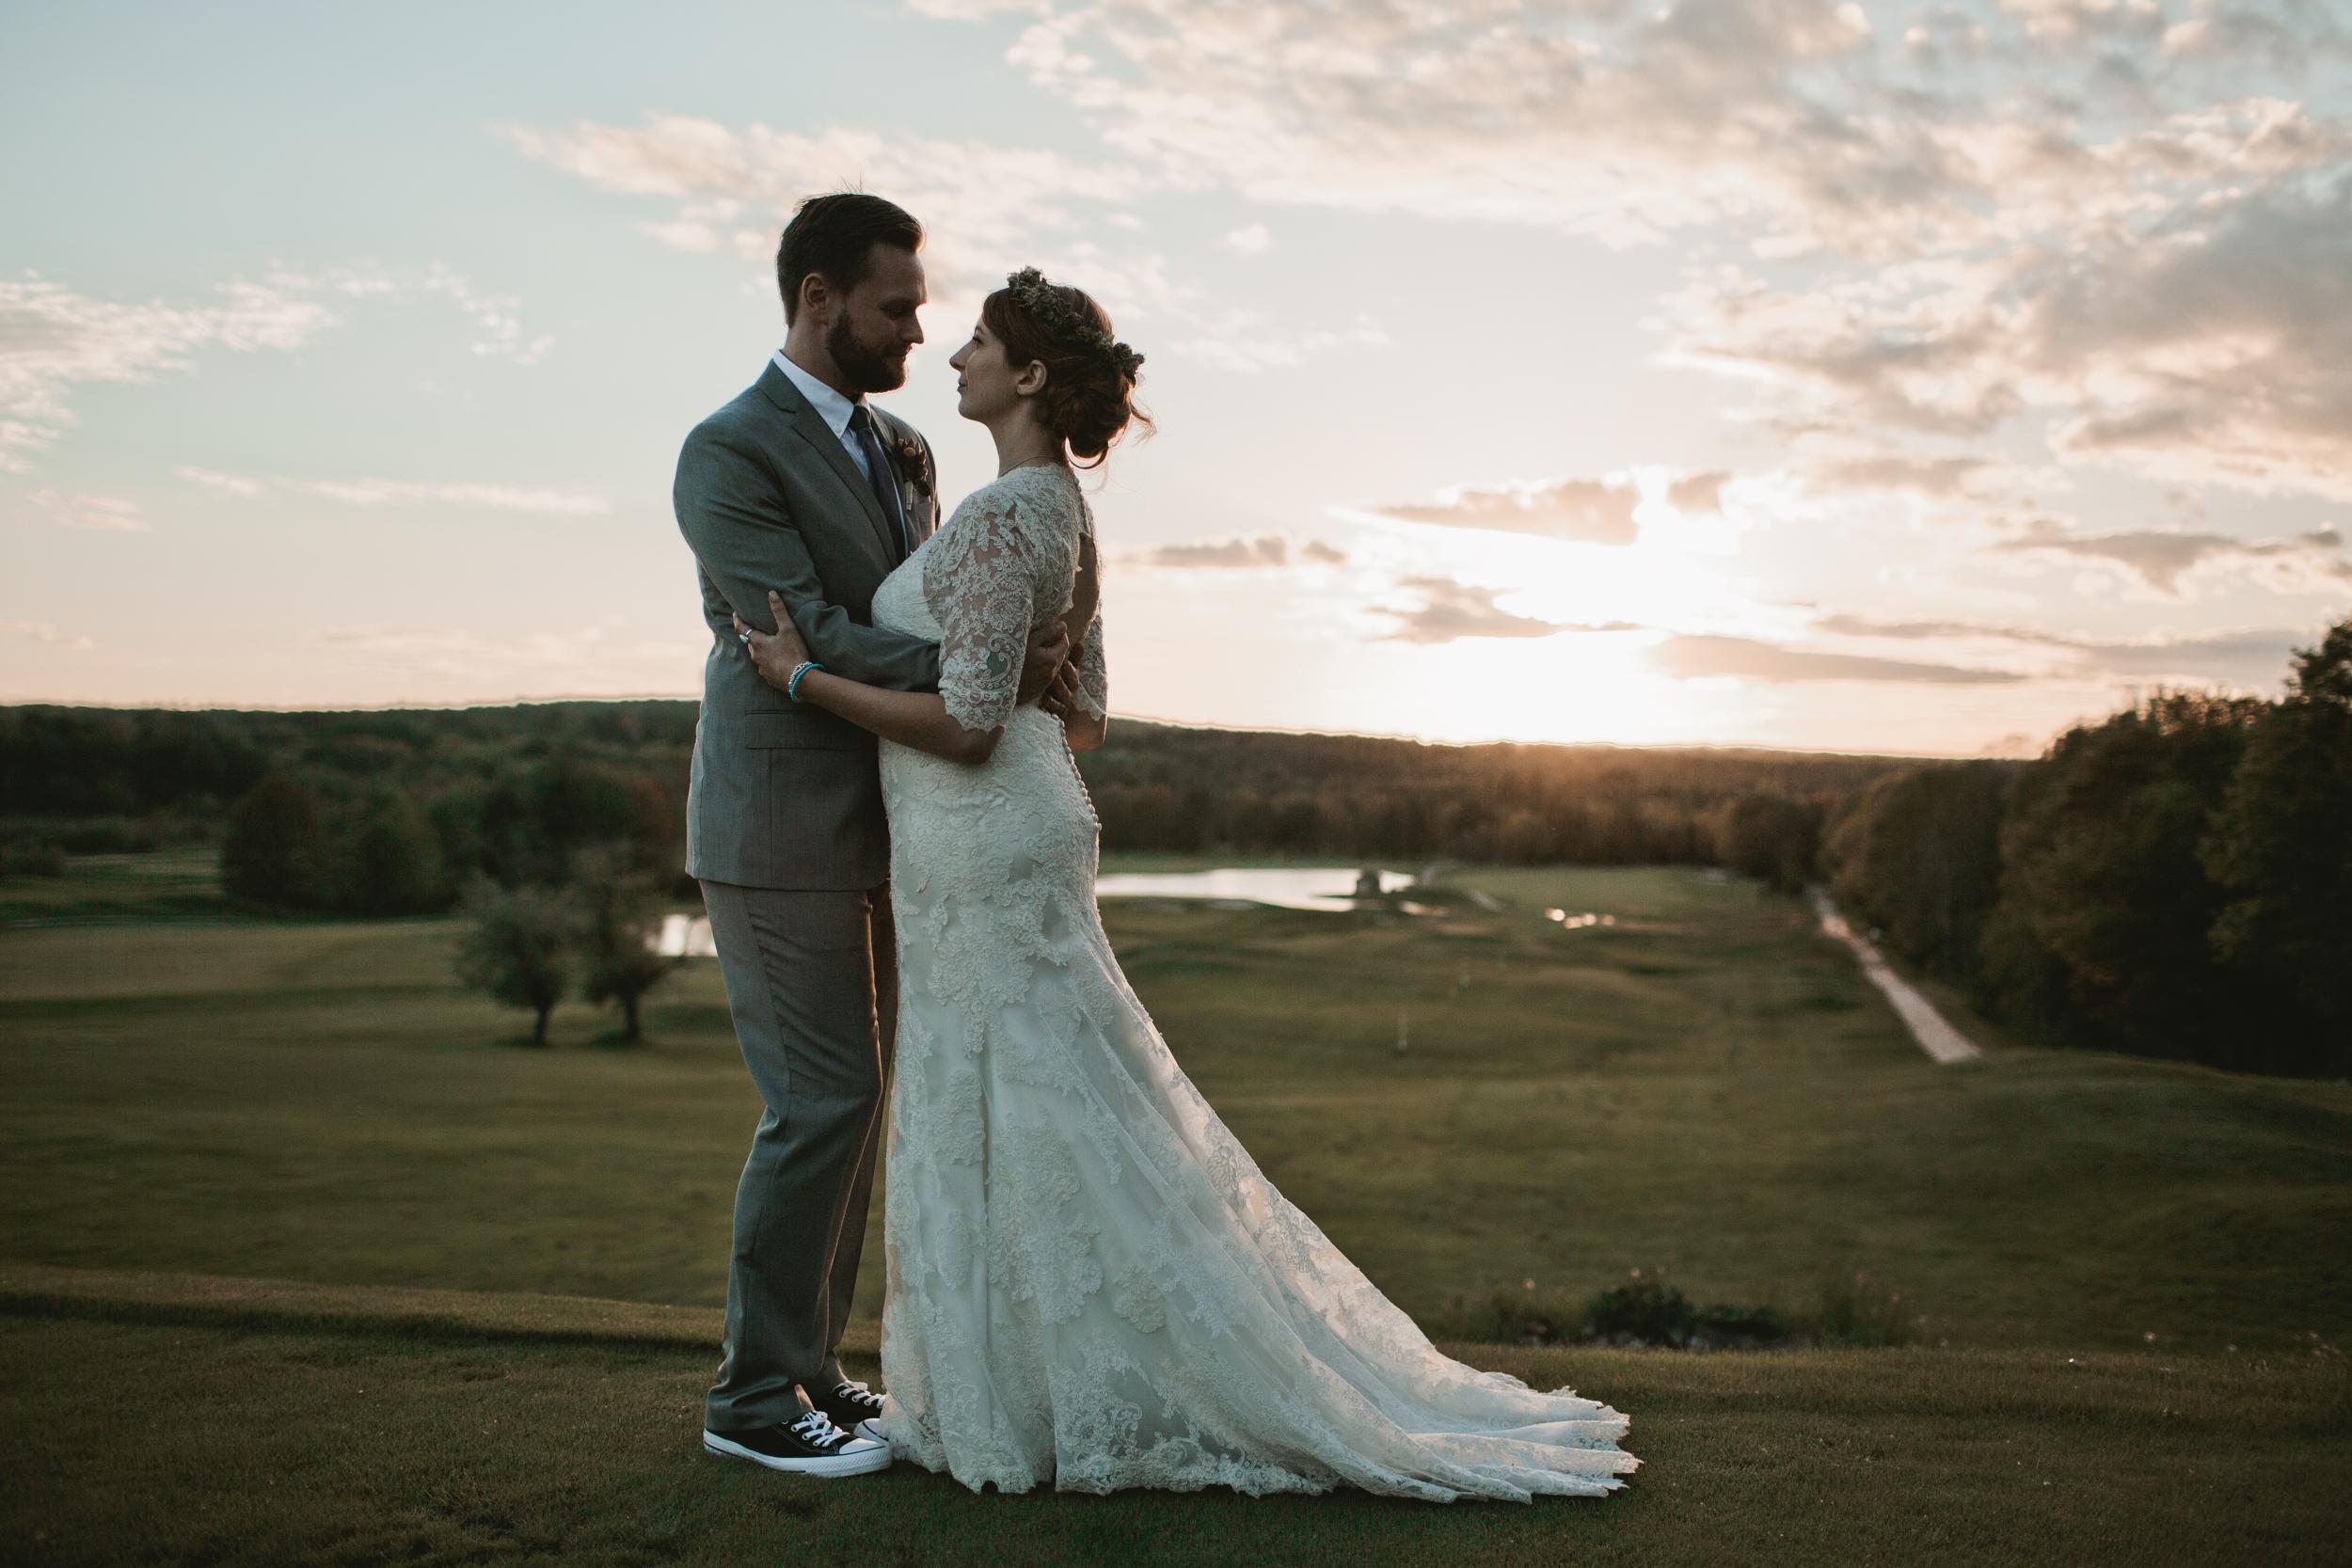 Spring-Meadows-Maine-Wedding-183.jpg